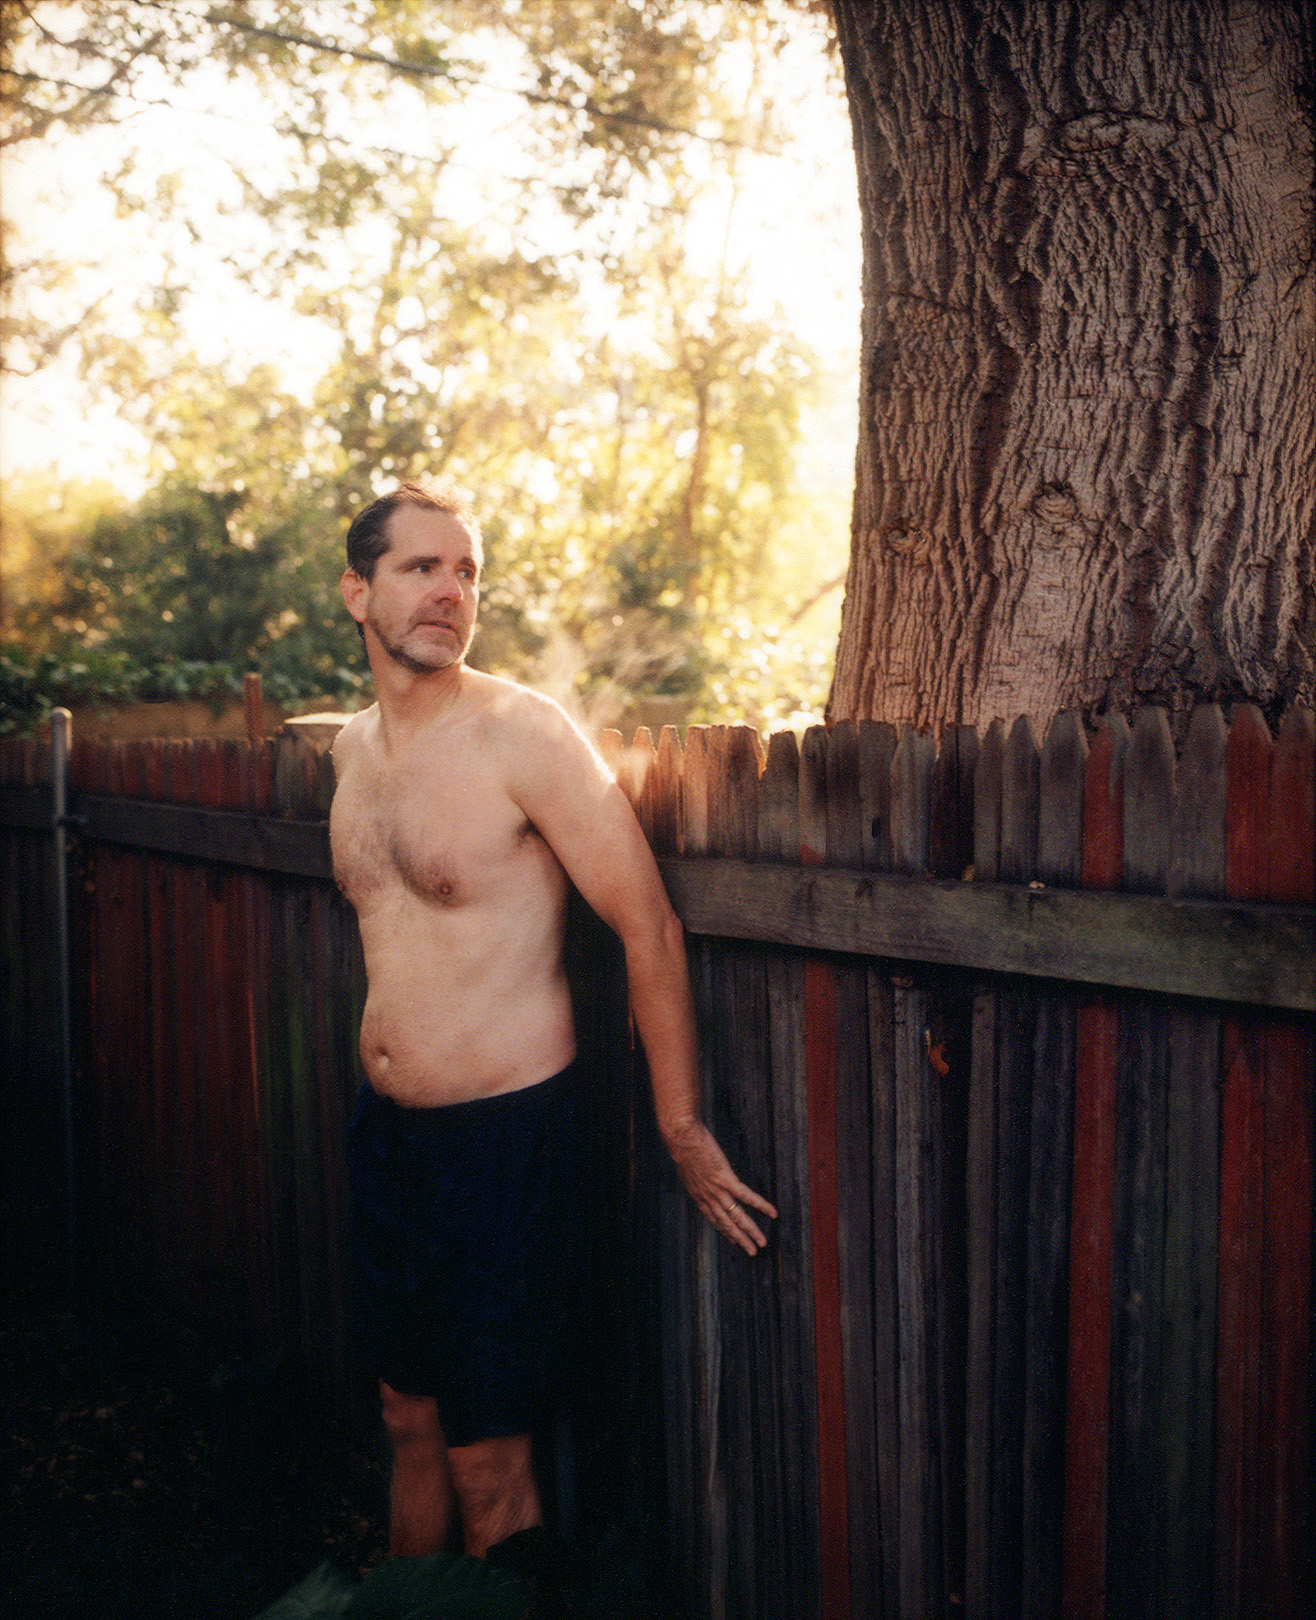 Chris Buck, Los Angeles, CA